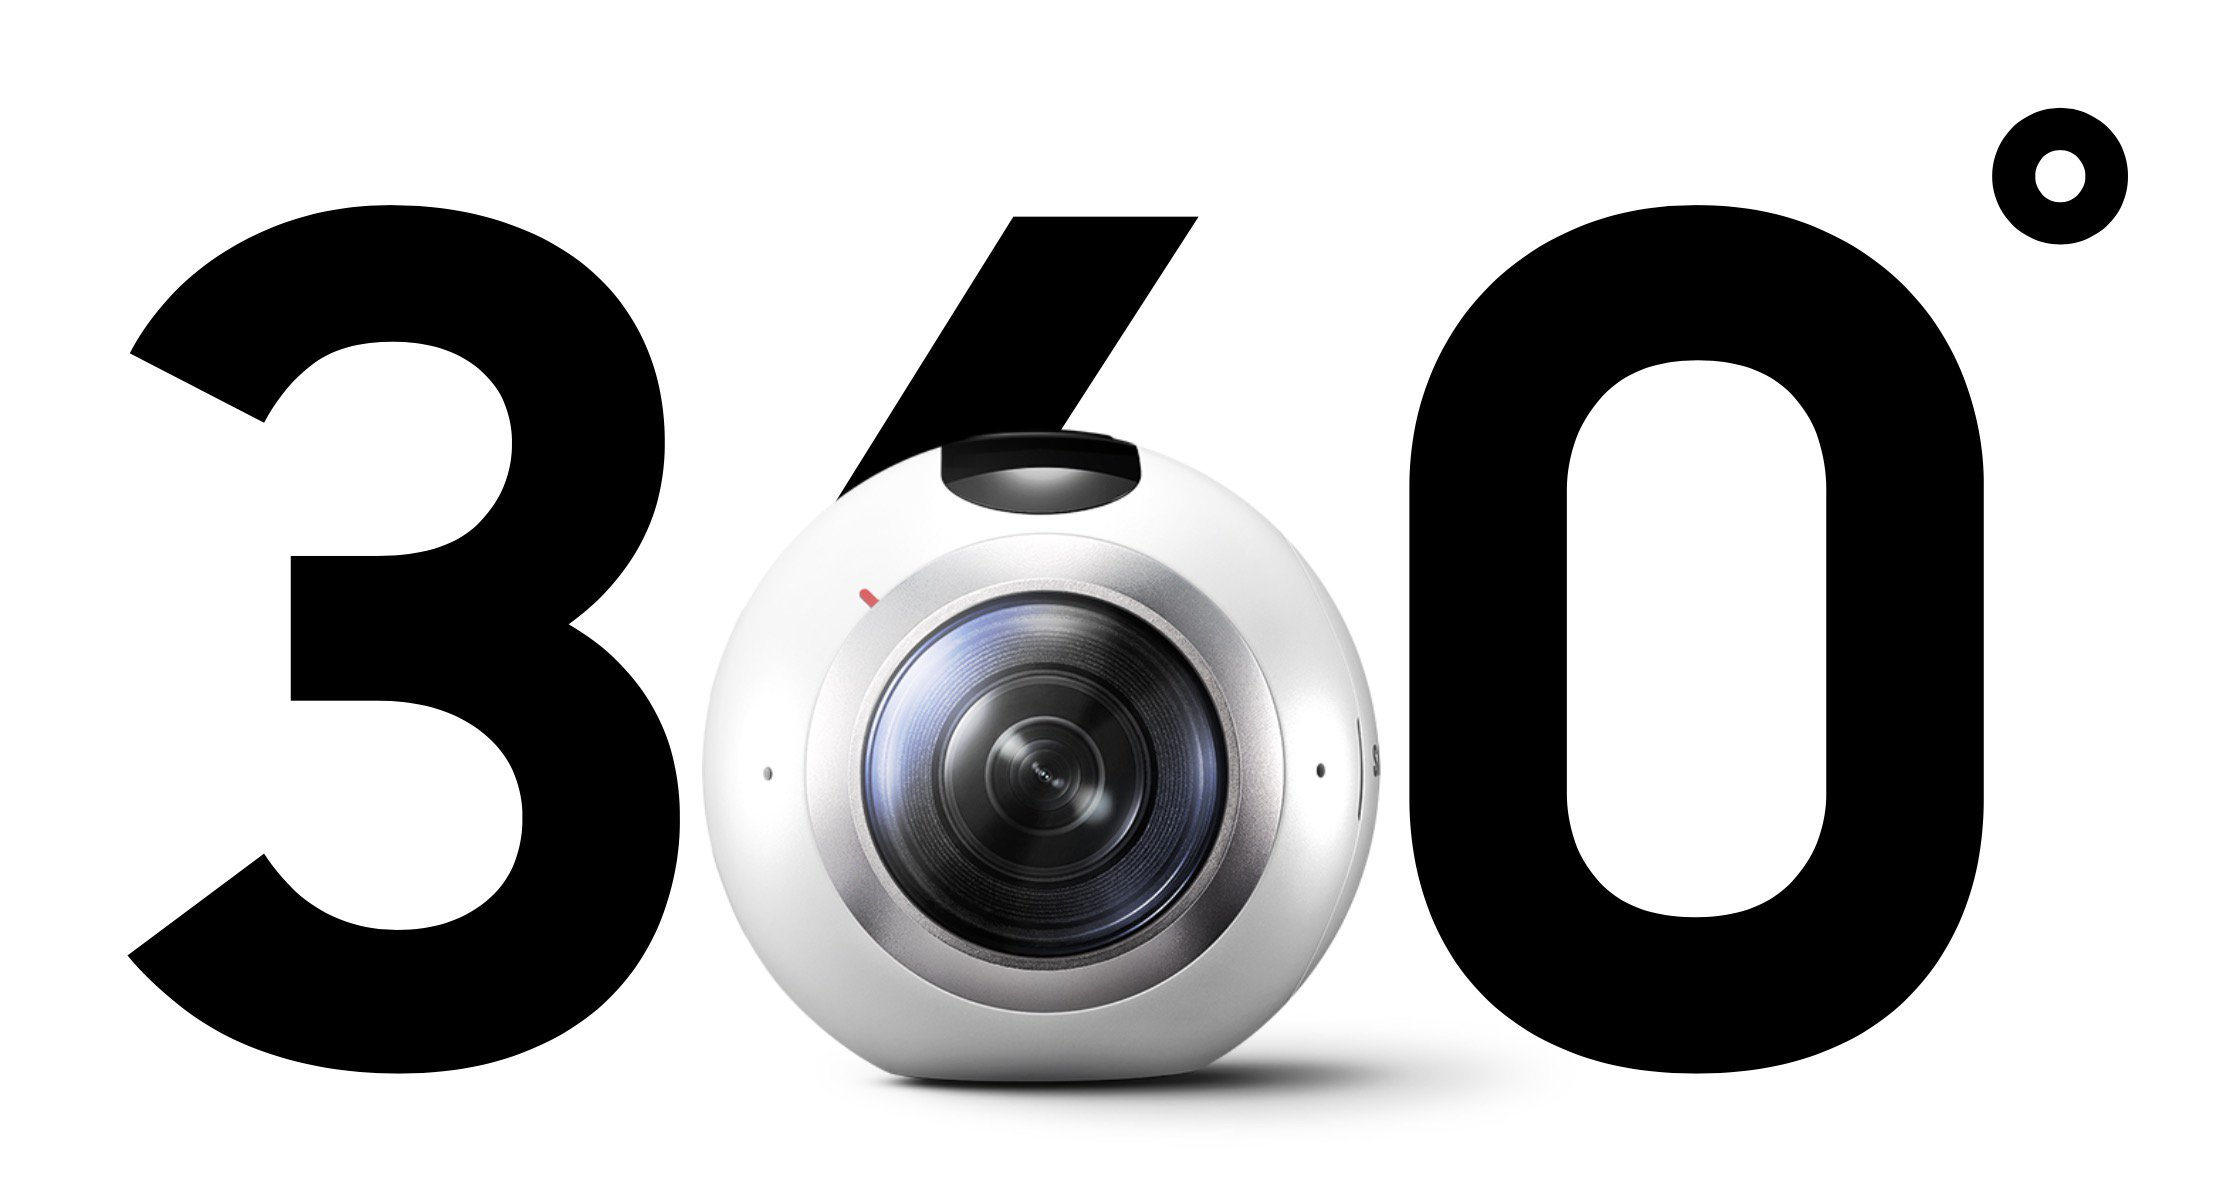 samsung gear 360 mwc 2016 (5)